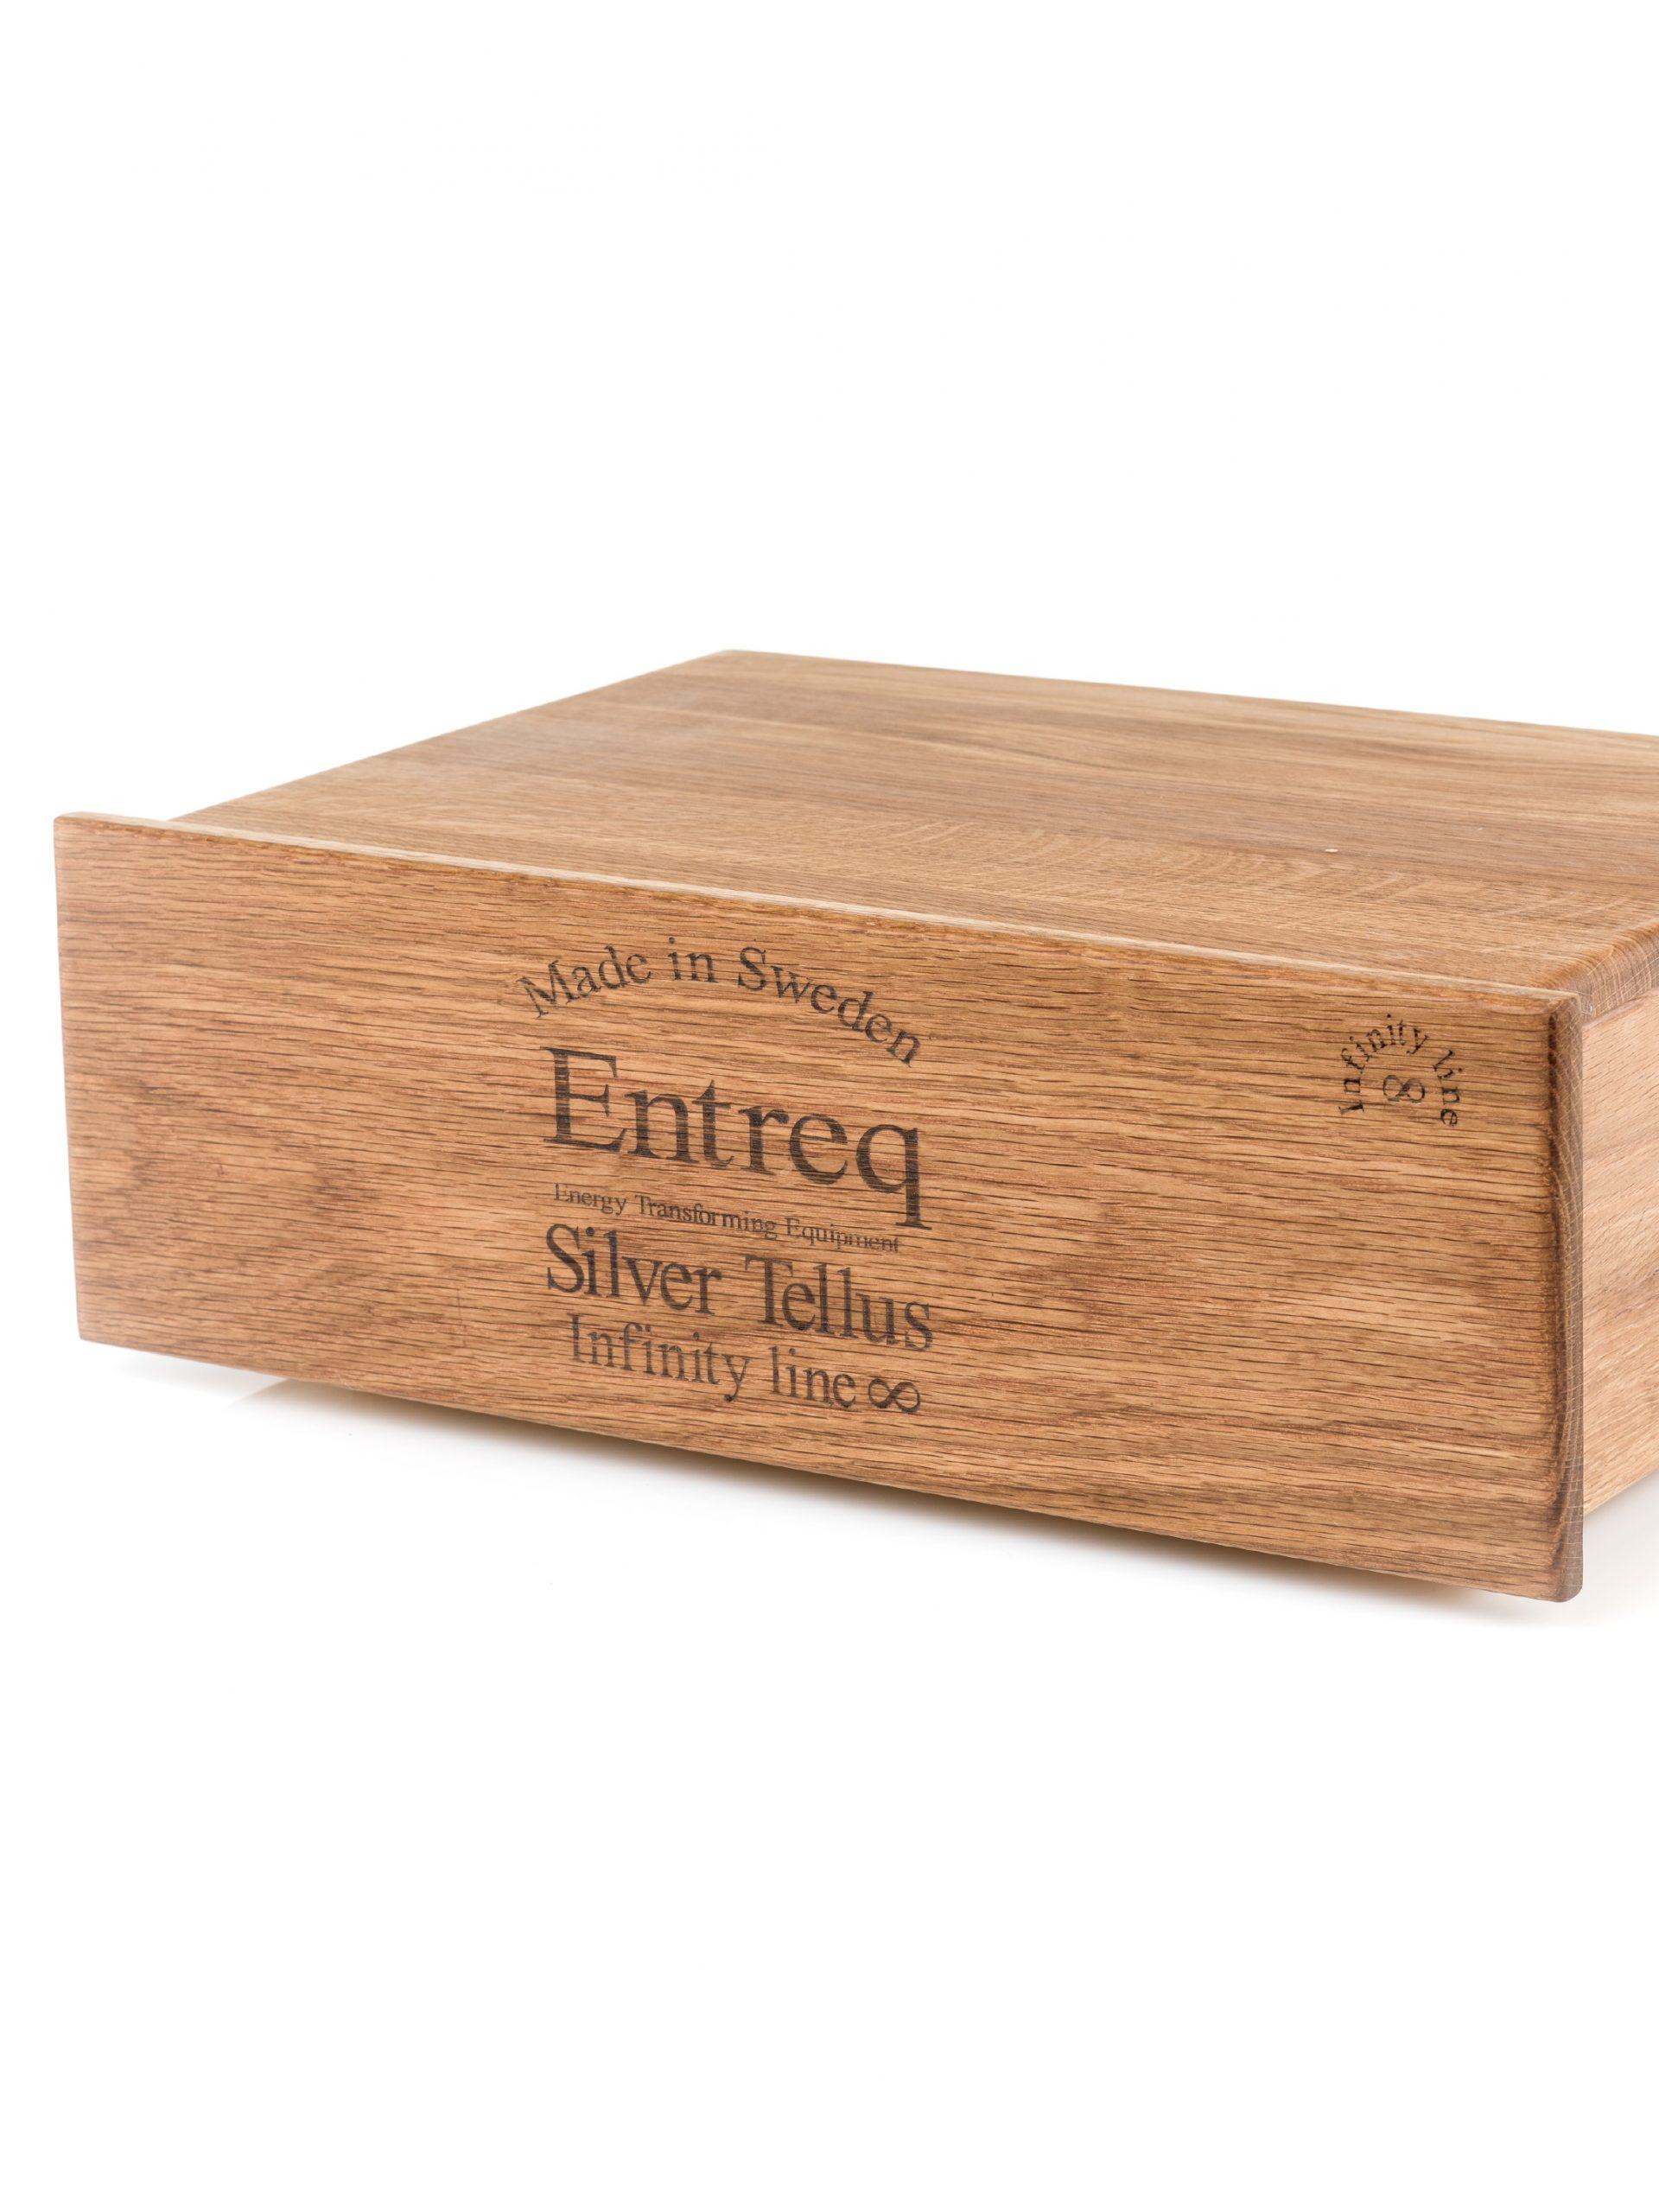 Entreq Silver Tellus Infinity